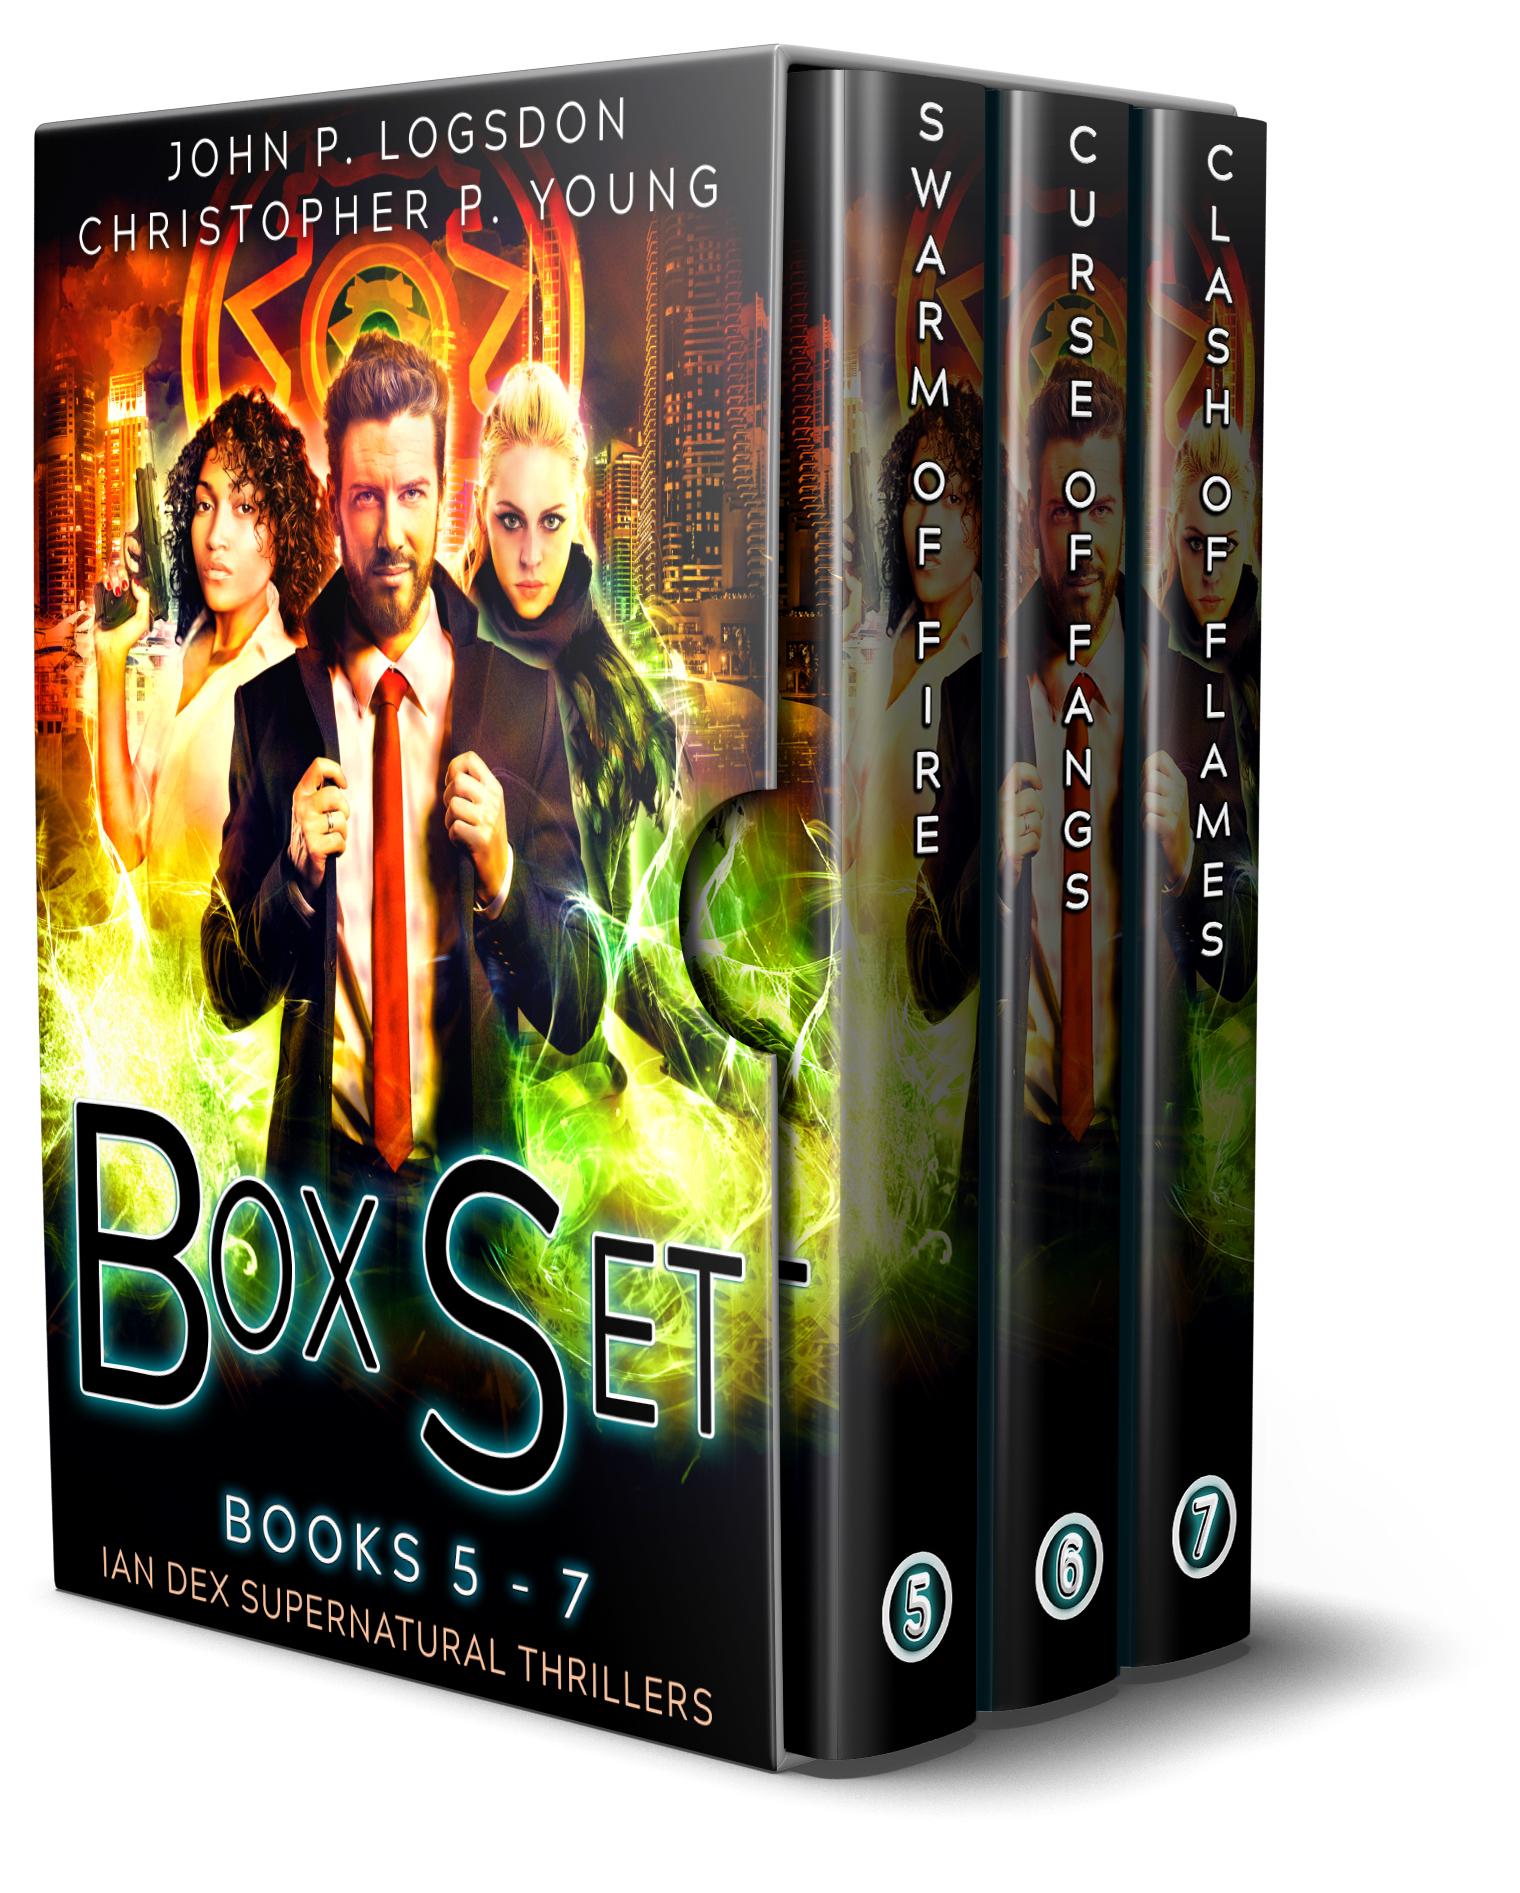 The Ian Dex Supernatural Thriller Box Set Two